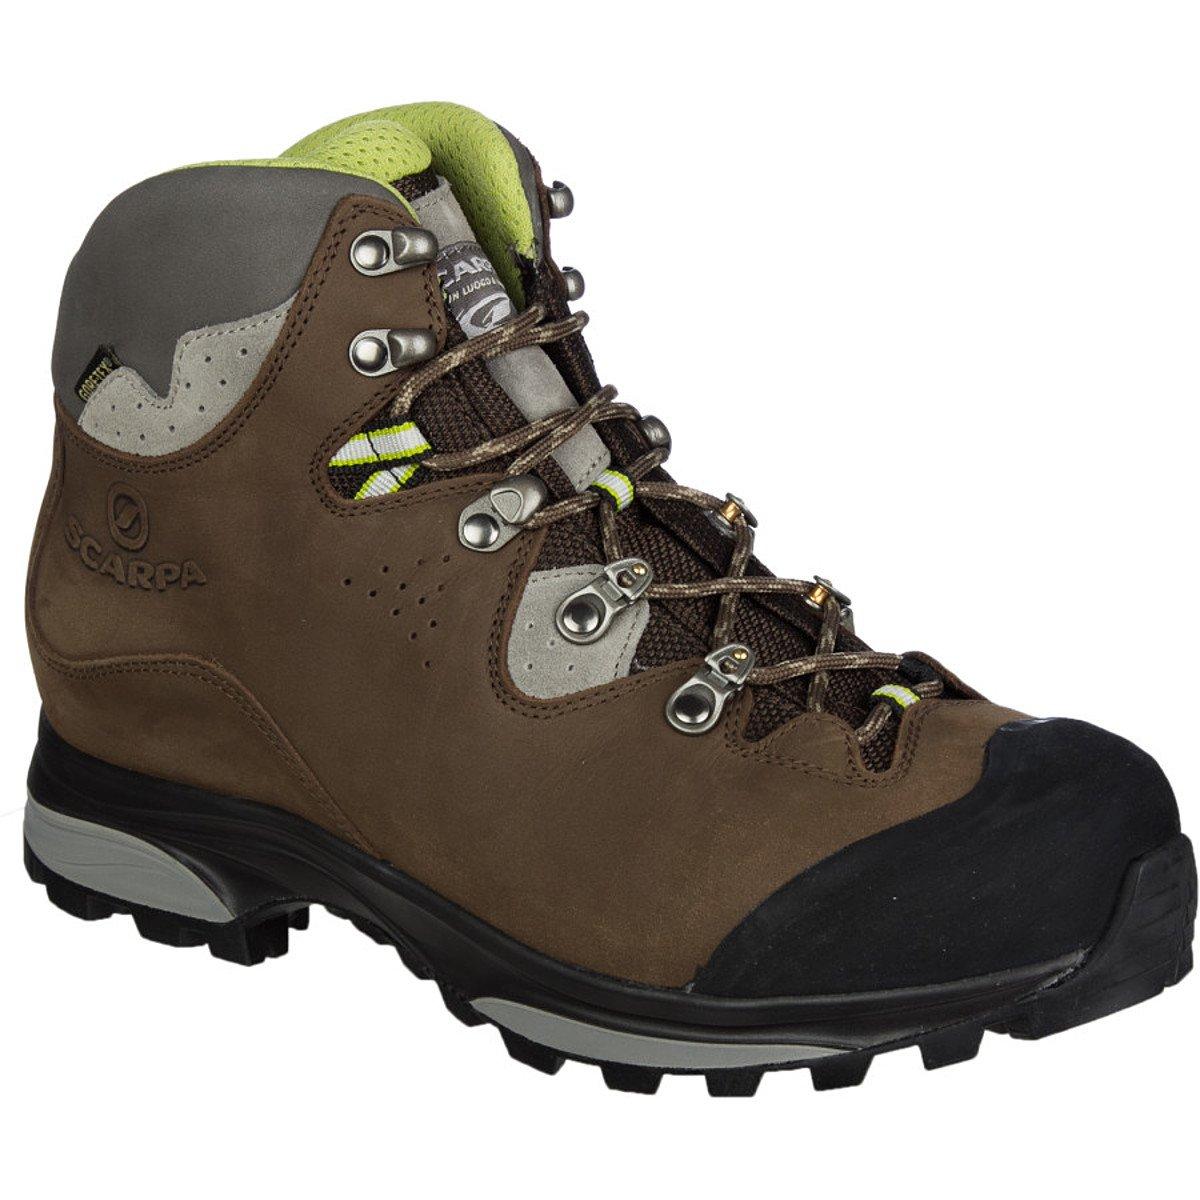 Scarpa Women's Hunza GTX Hiking Boot,Dark Brown,40 EU/8.5 M US